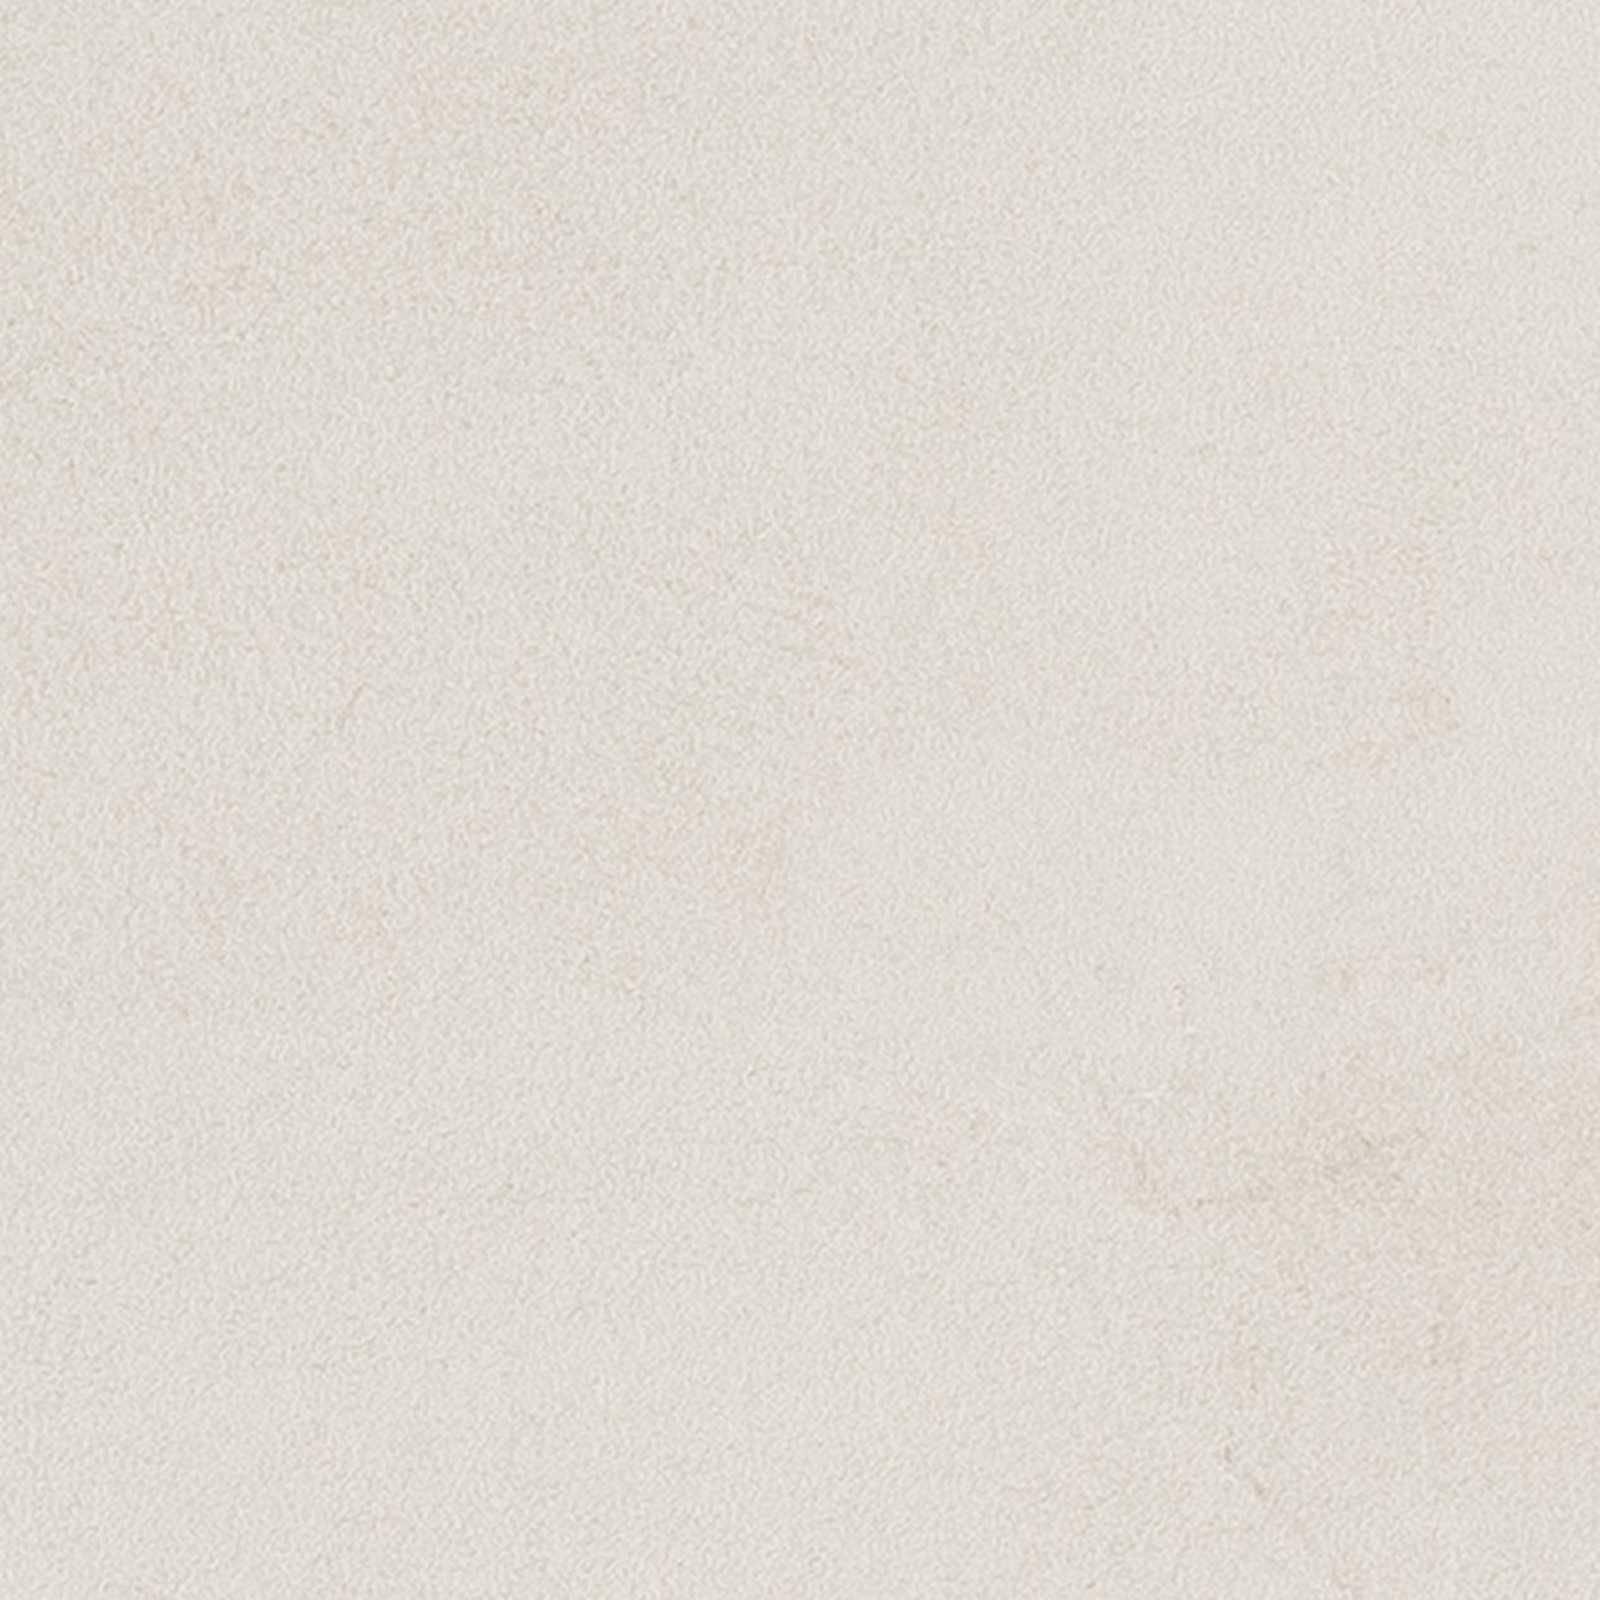 BLOCK   750X750 WHITE - (Euro/Mq 32,21)